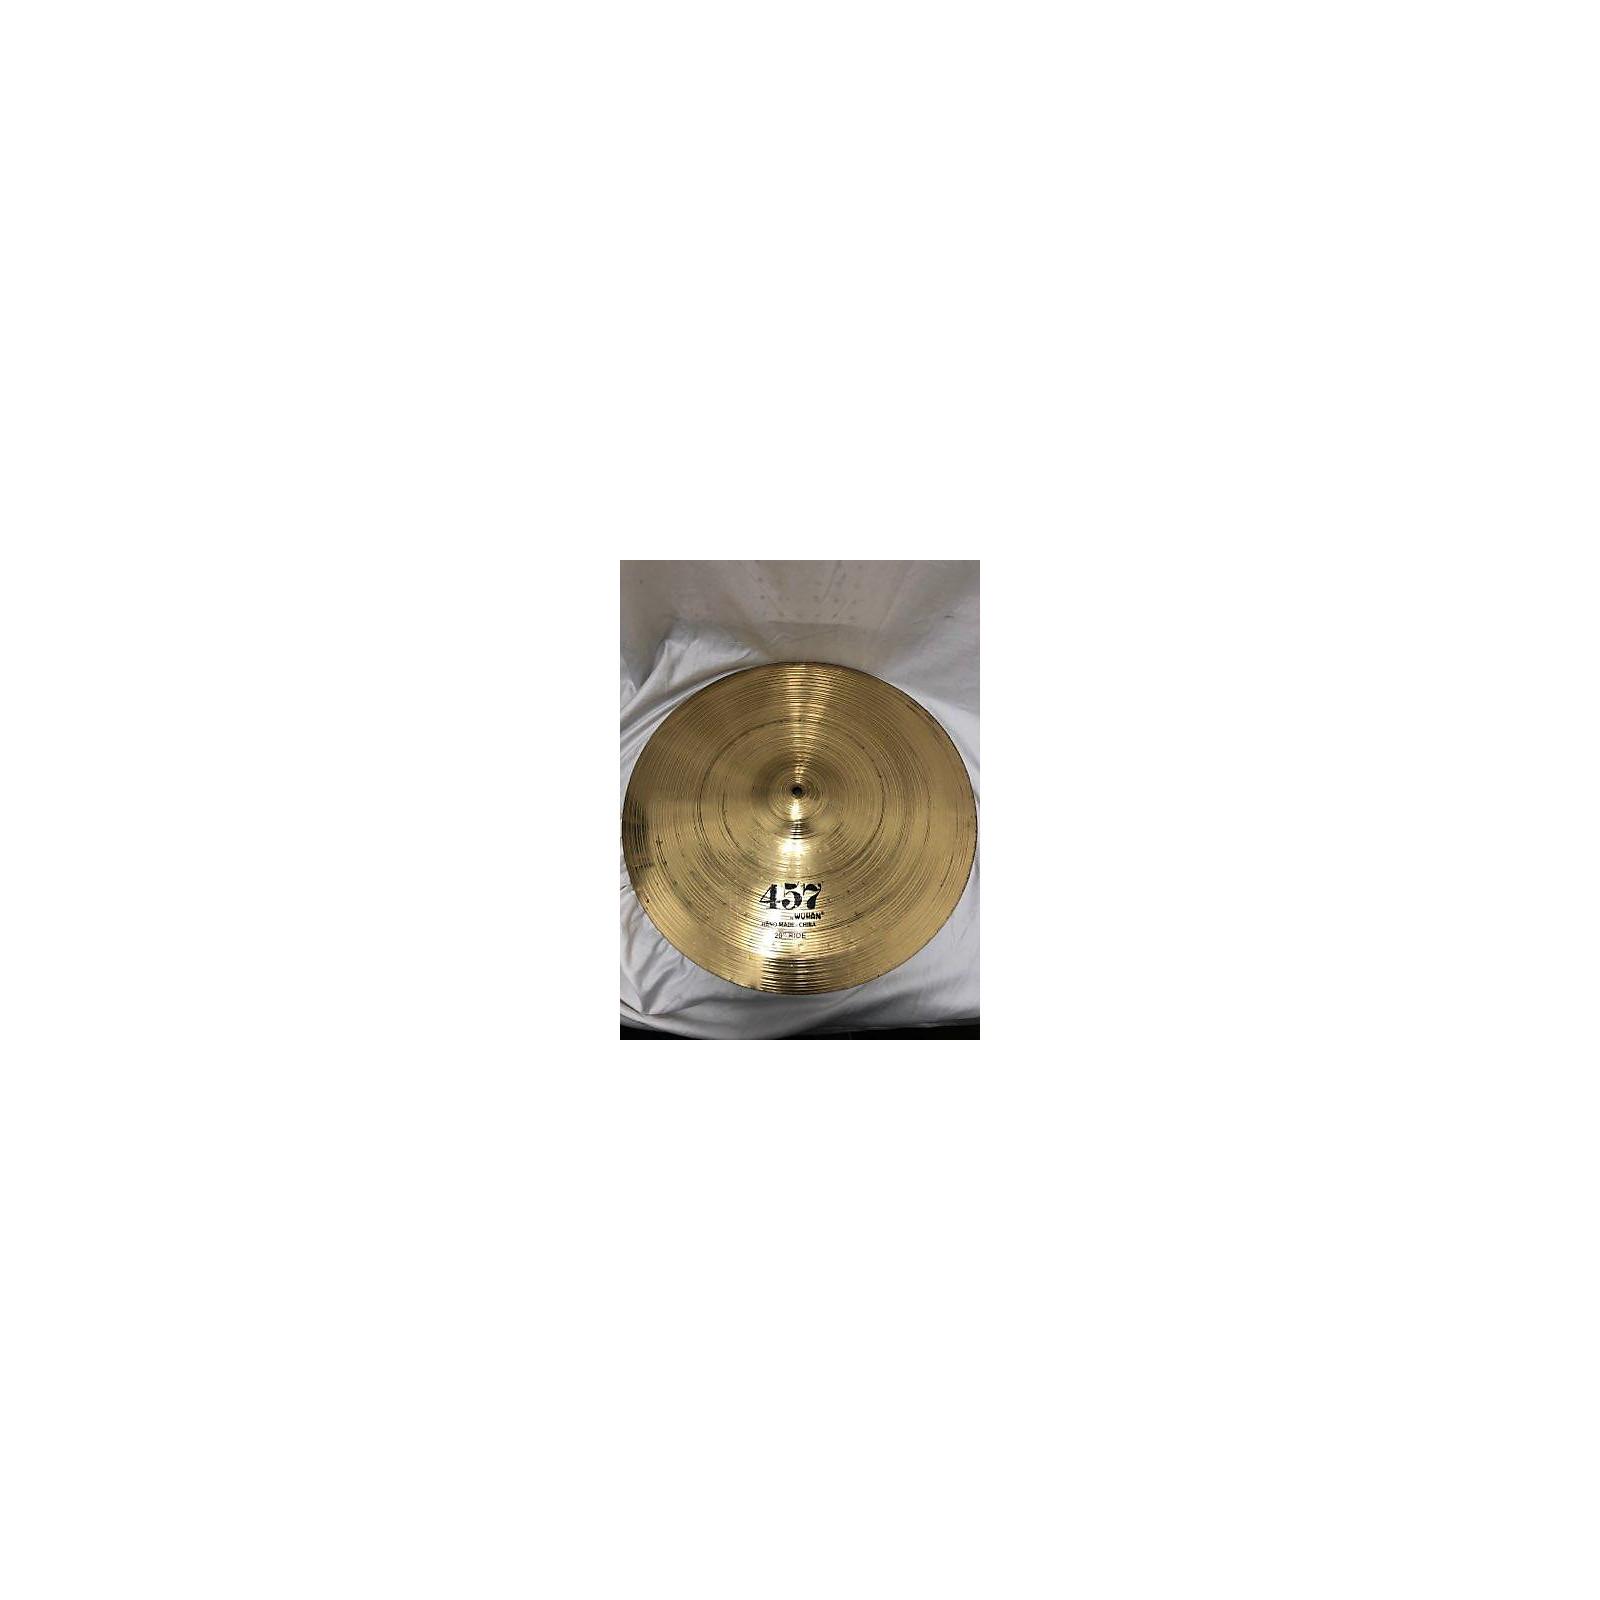 Wuhan 20in 457 Cymbal